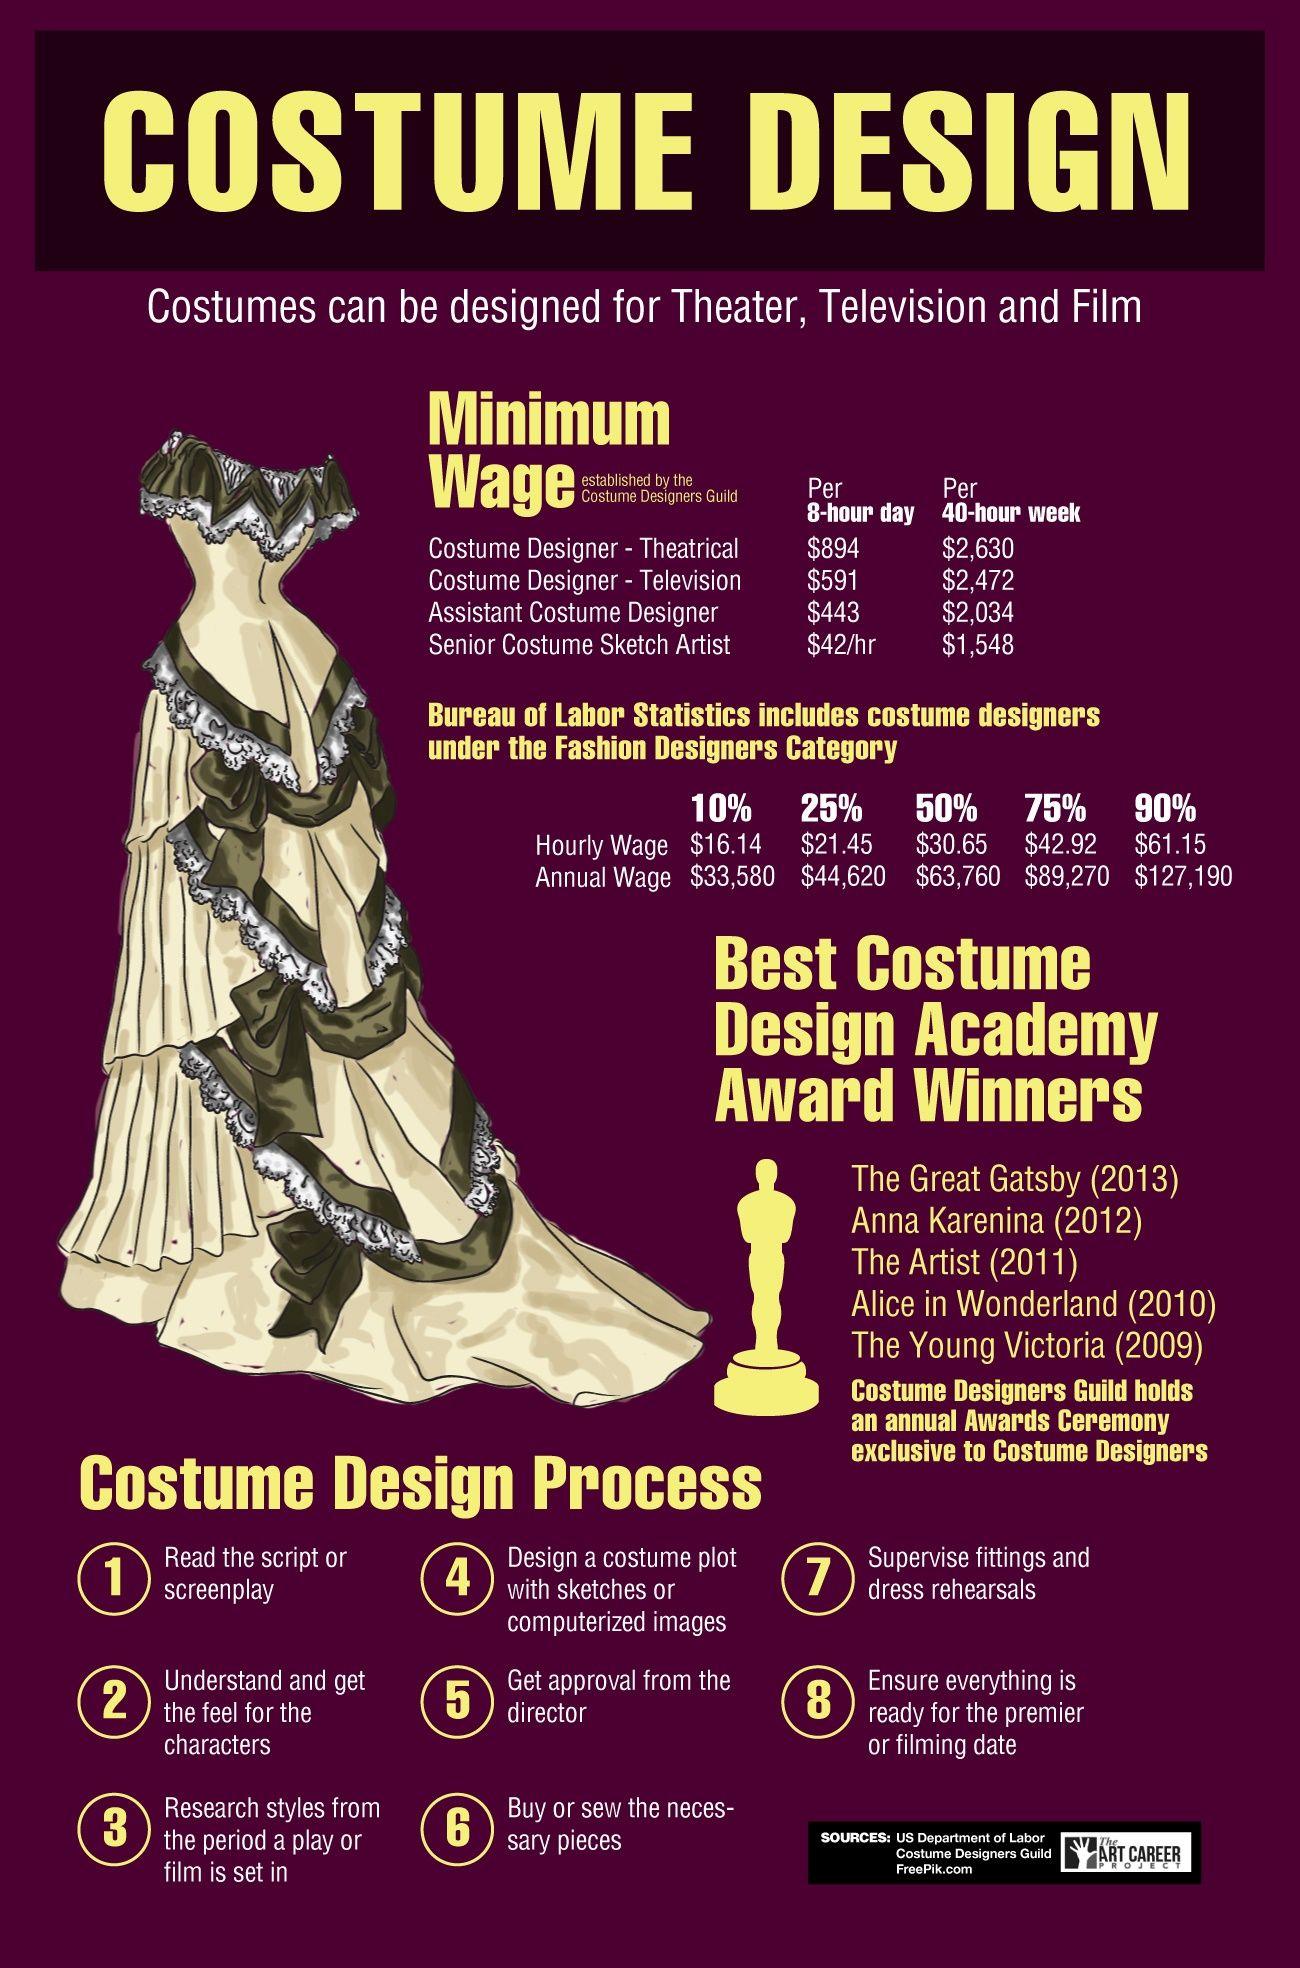 How To Become A Costume Designer Costume Design Costume Design